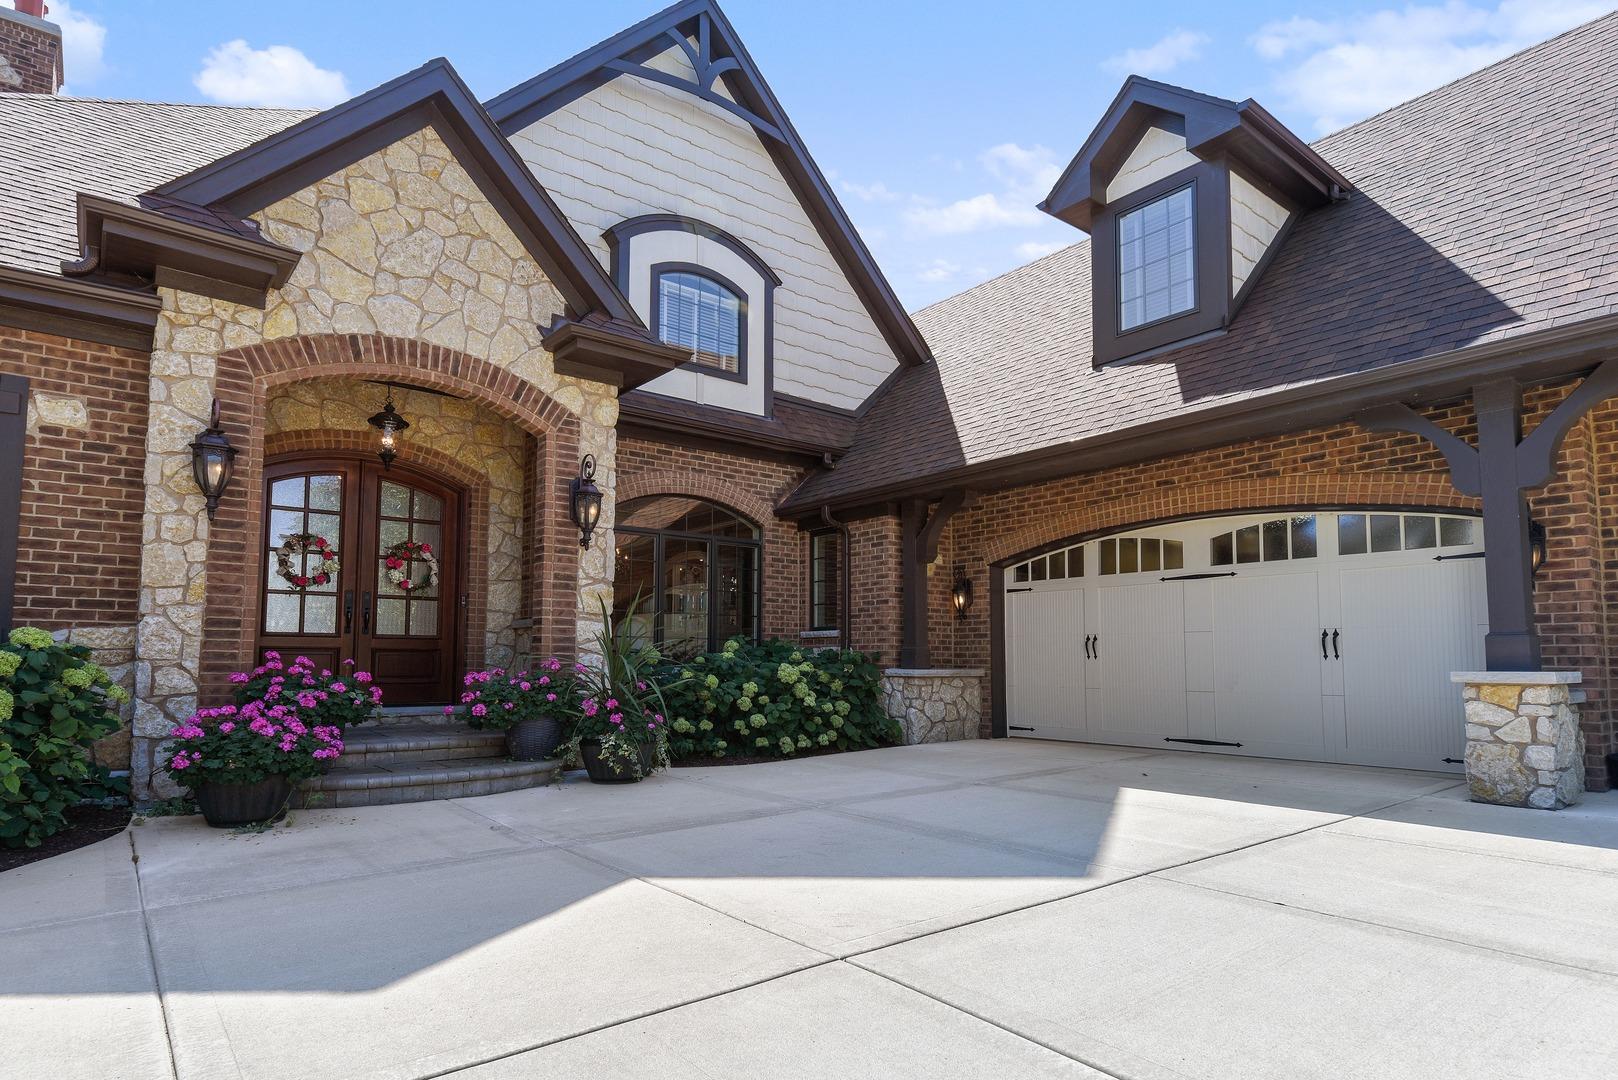 11699 Flagstone Turn, Frankfort, Illinois, 60423